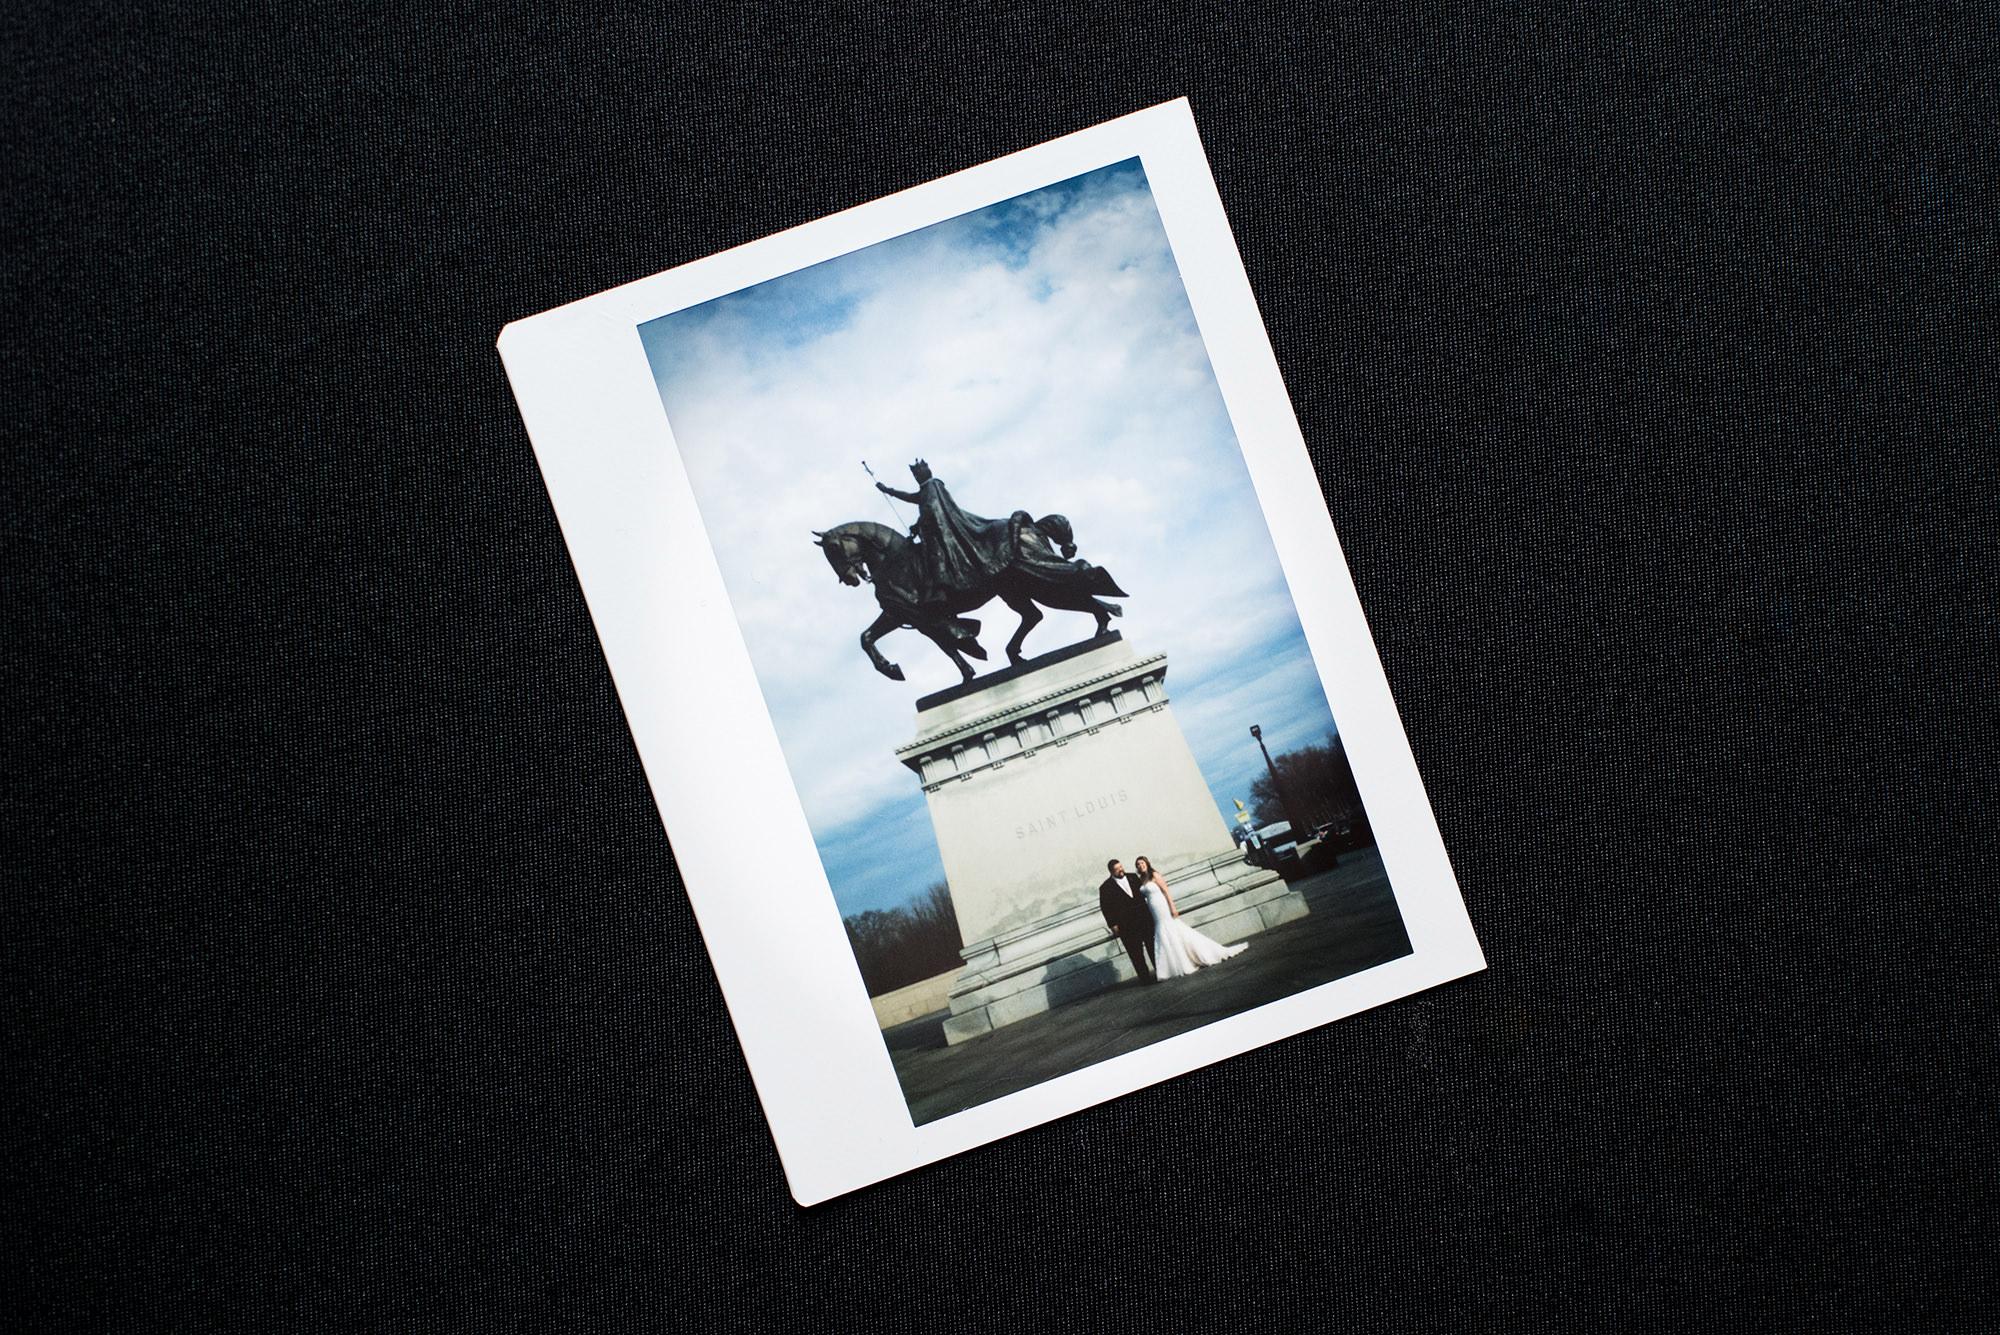 9-st.louis-art-history-museum-s-louis-statue-sarah-corbett-photography-polaroids.jpg